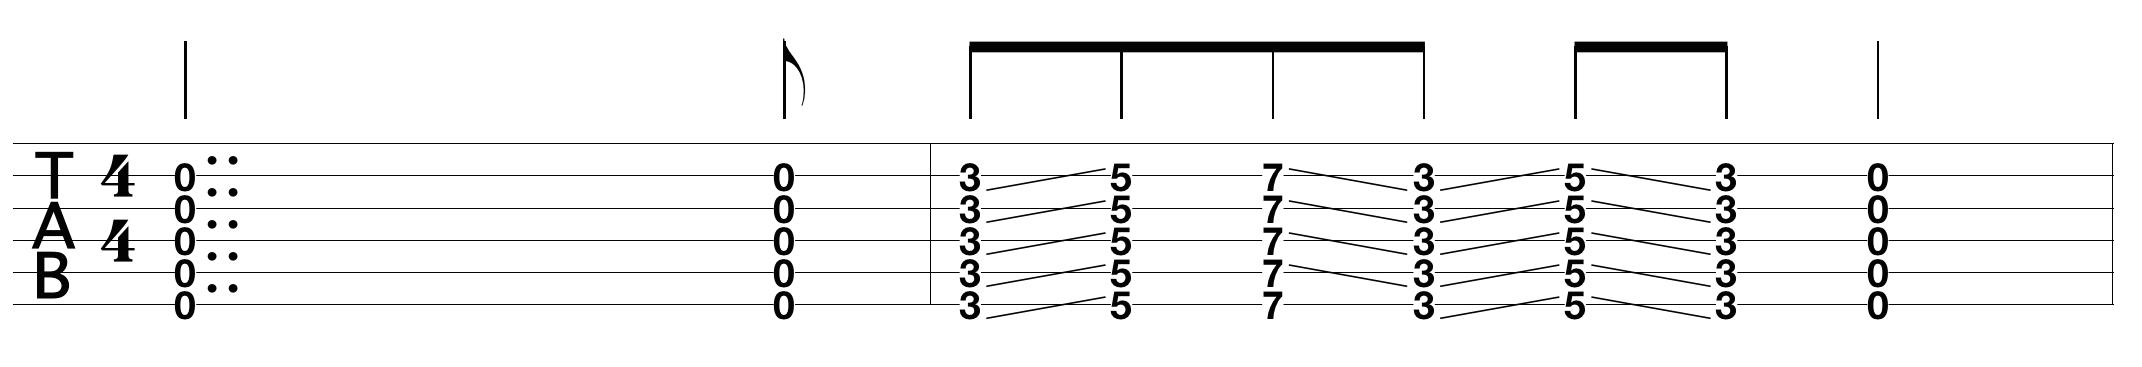 blues-guitar-strings_1.png